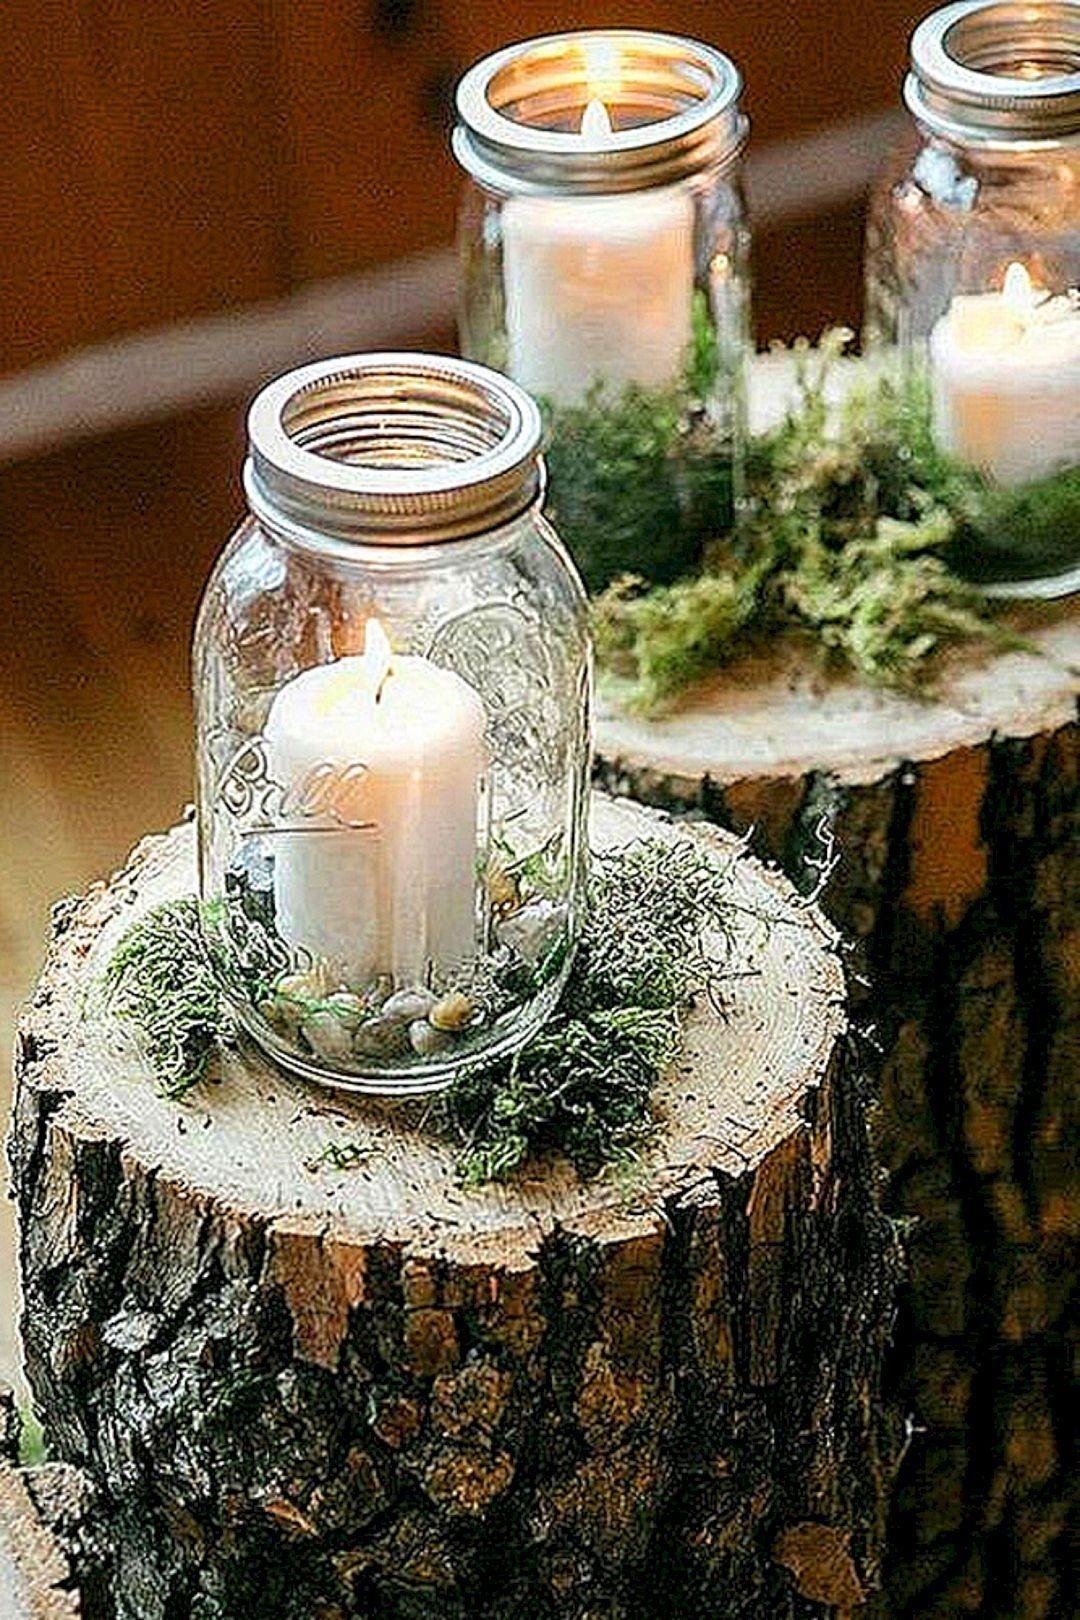 rustic-chic-wedding-decor-elegant-128-di